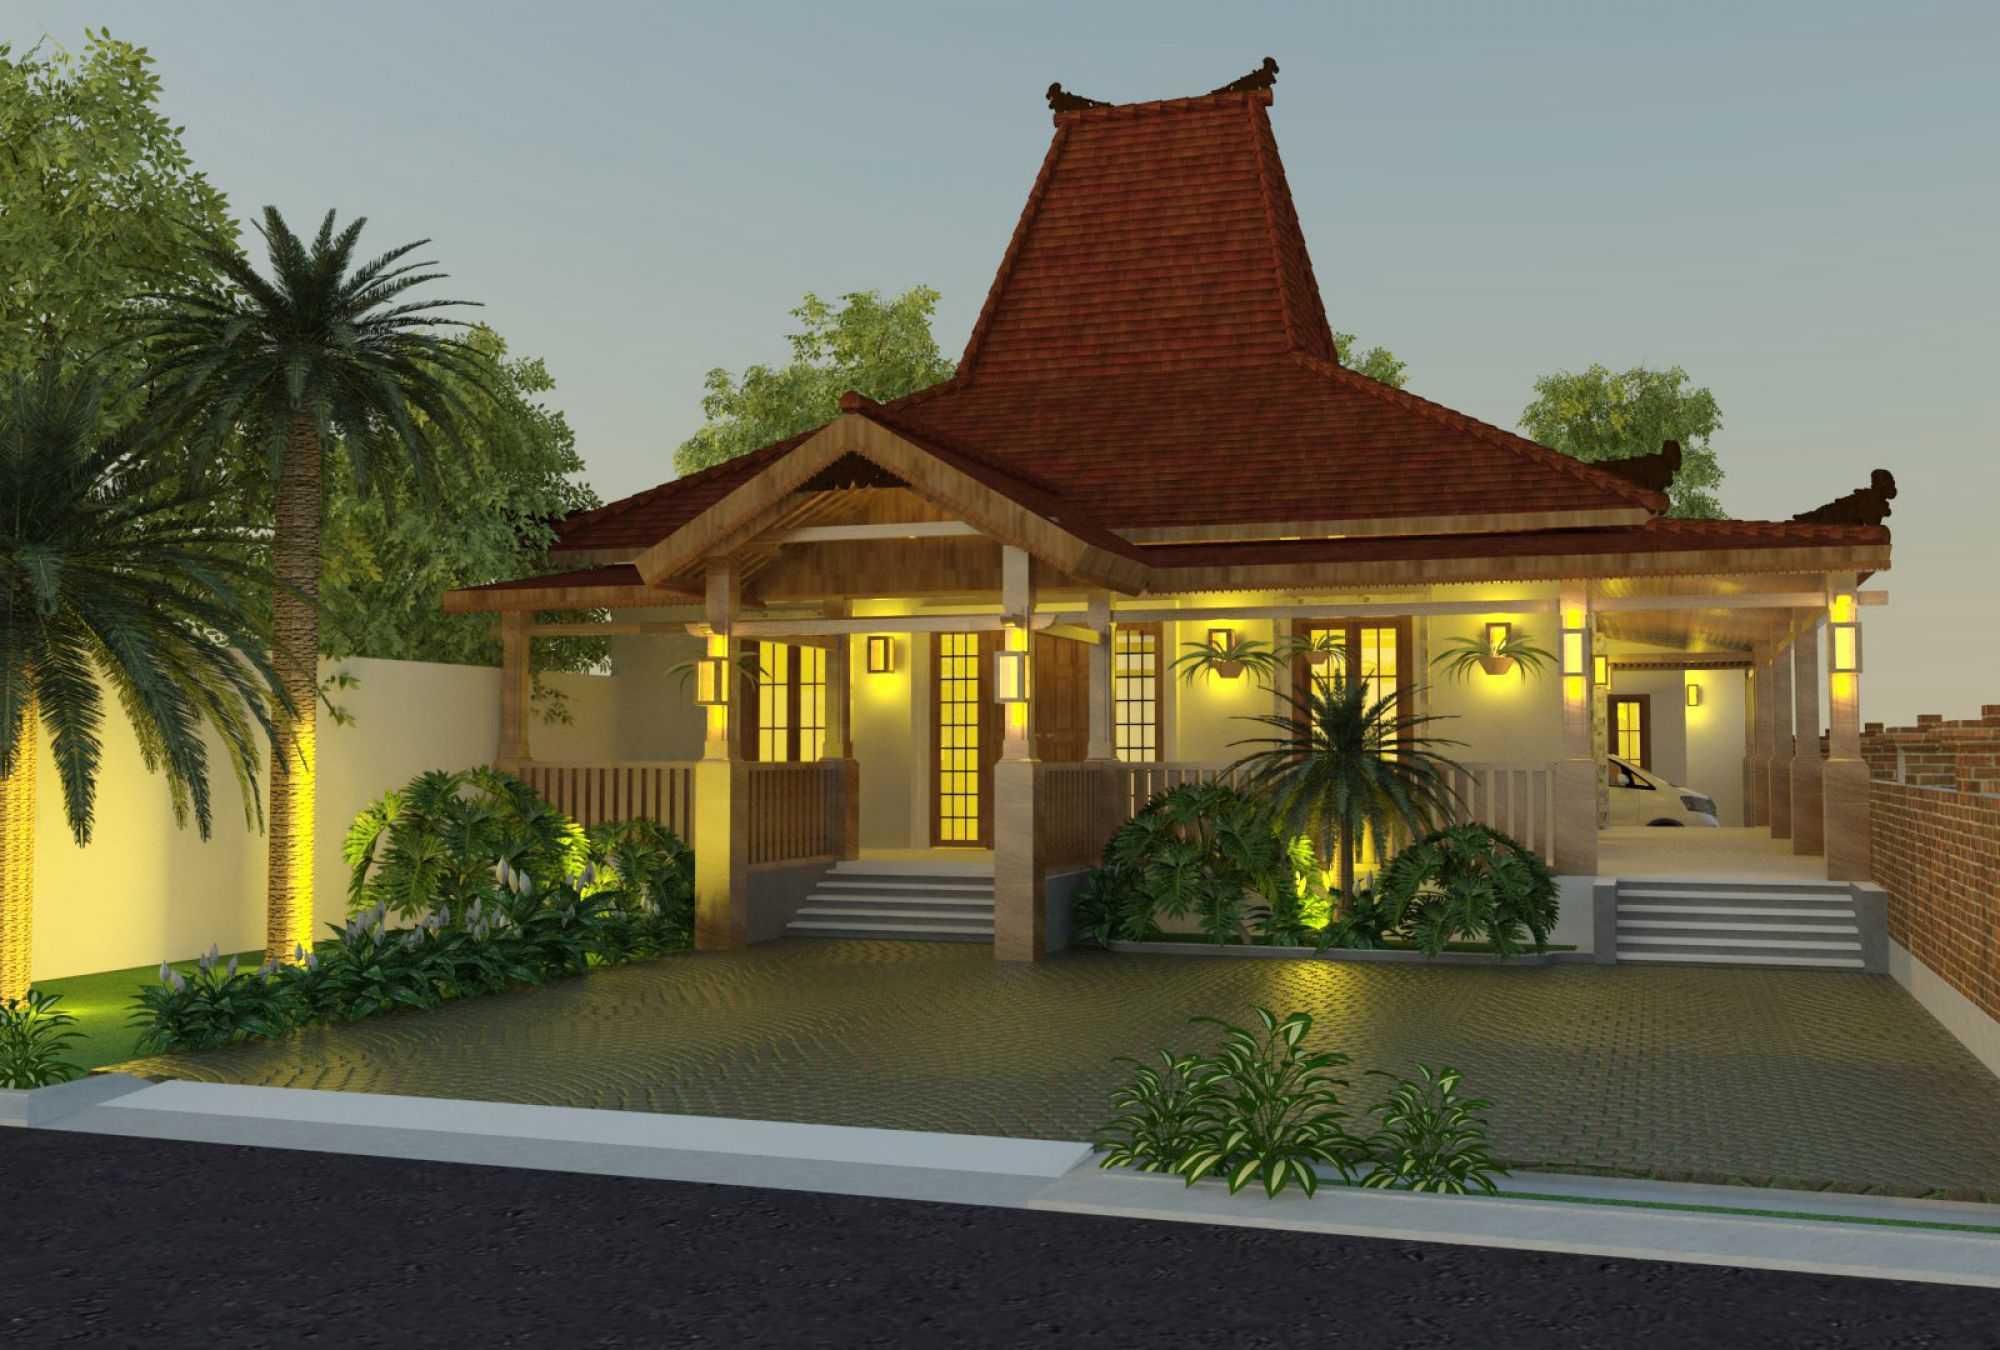 Rumah Joglo Minimalis Untuk Hunian Modern | Desain, Gambar